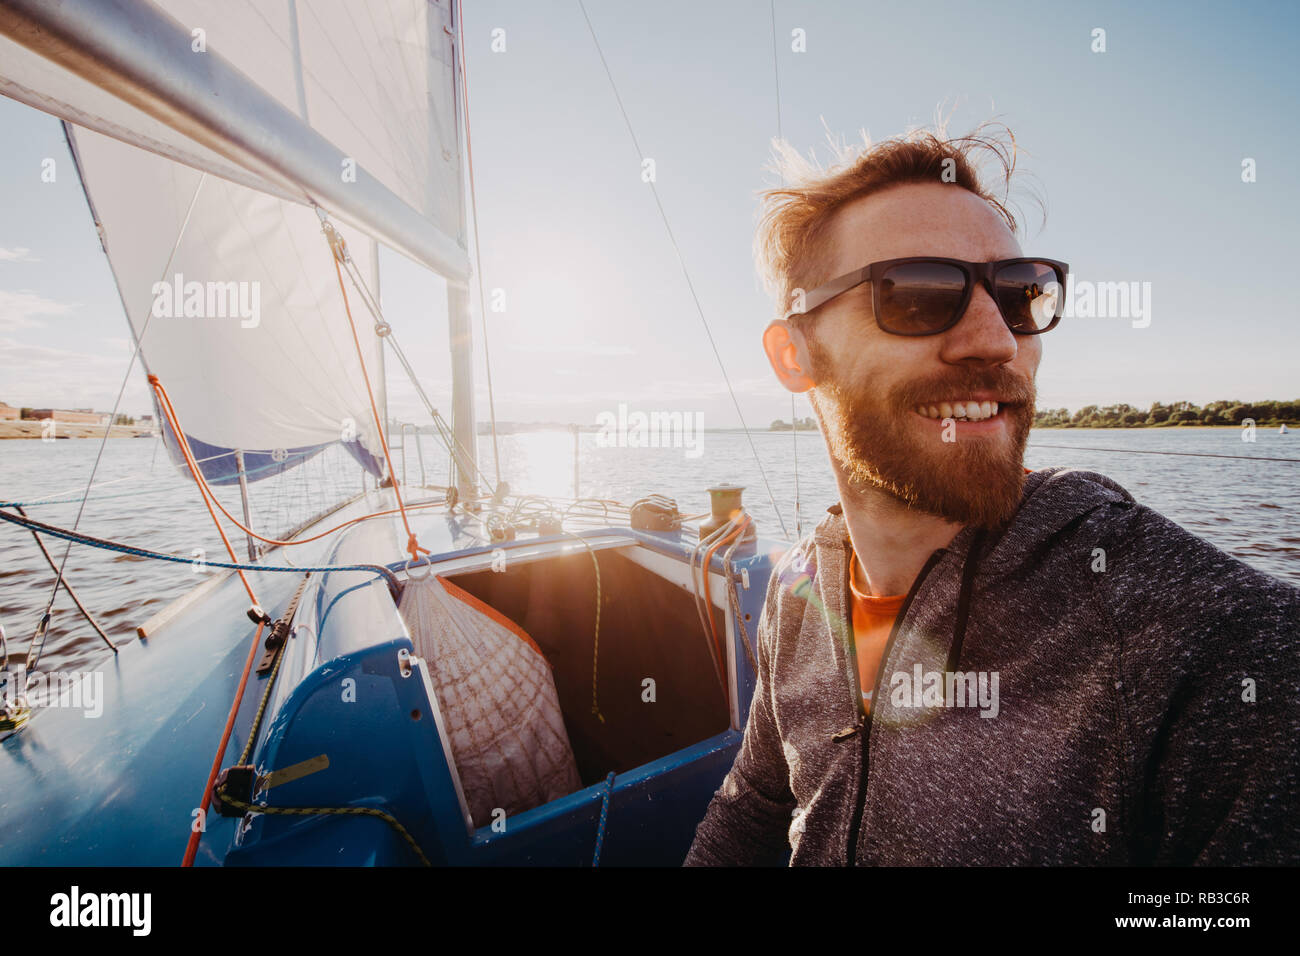 Navy Sea Captain Sunglasses